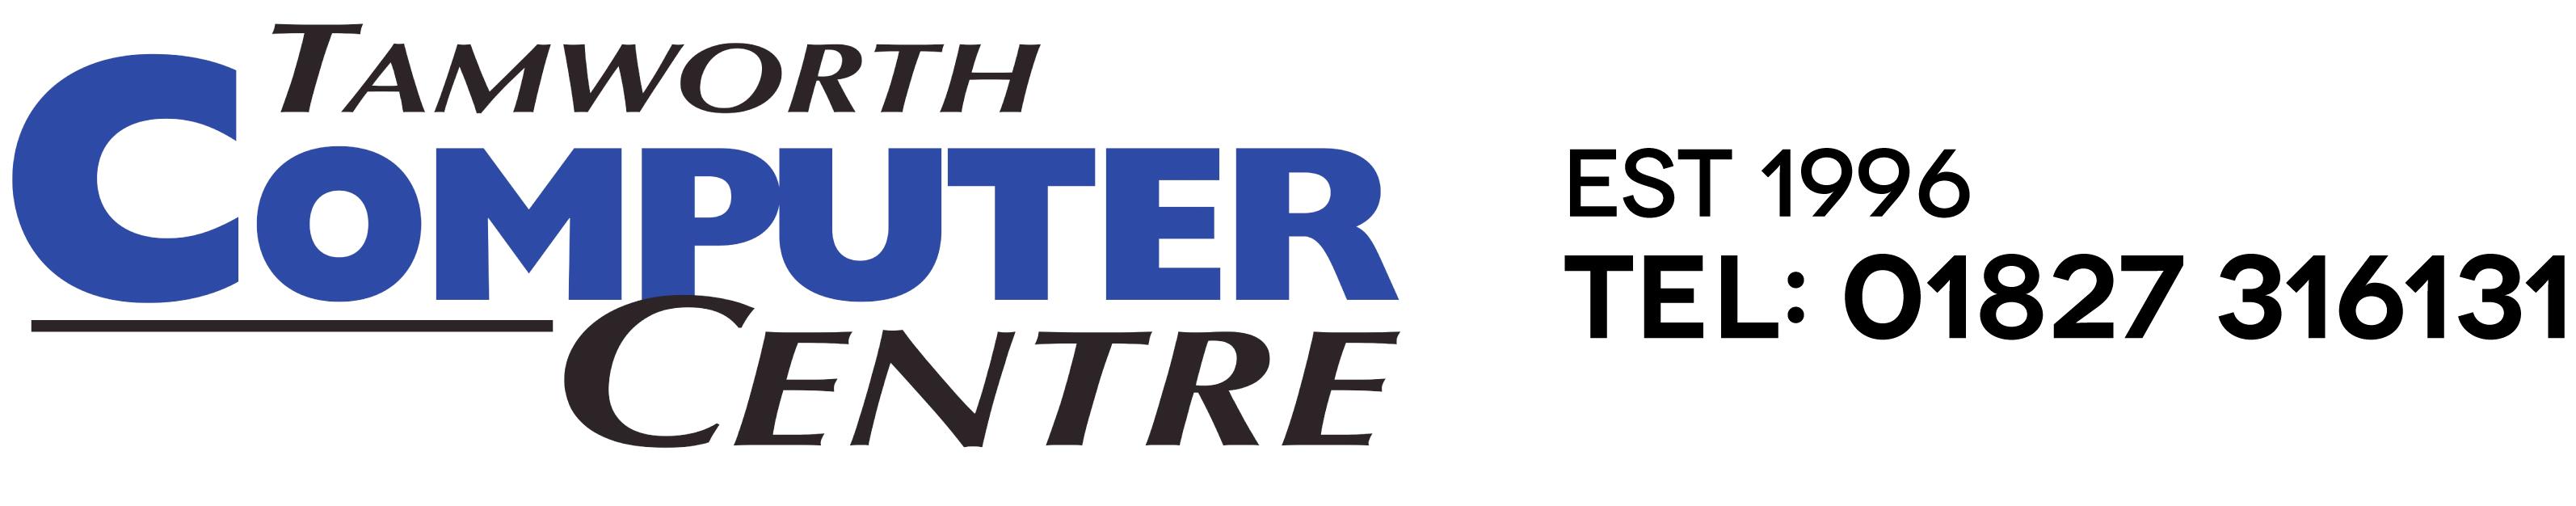 Tamworth Computer Centre